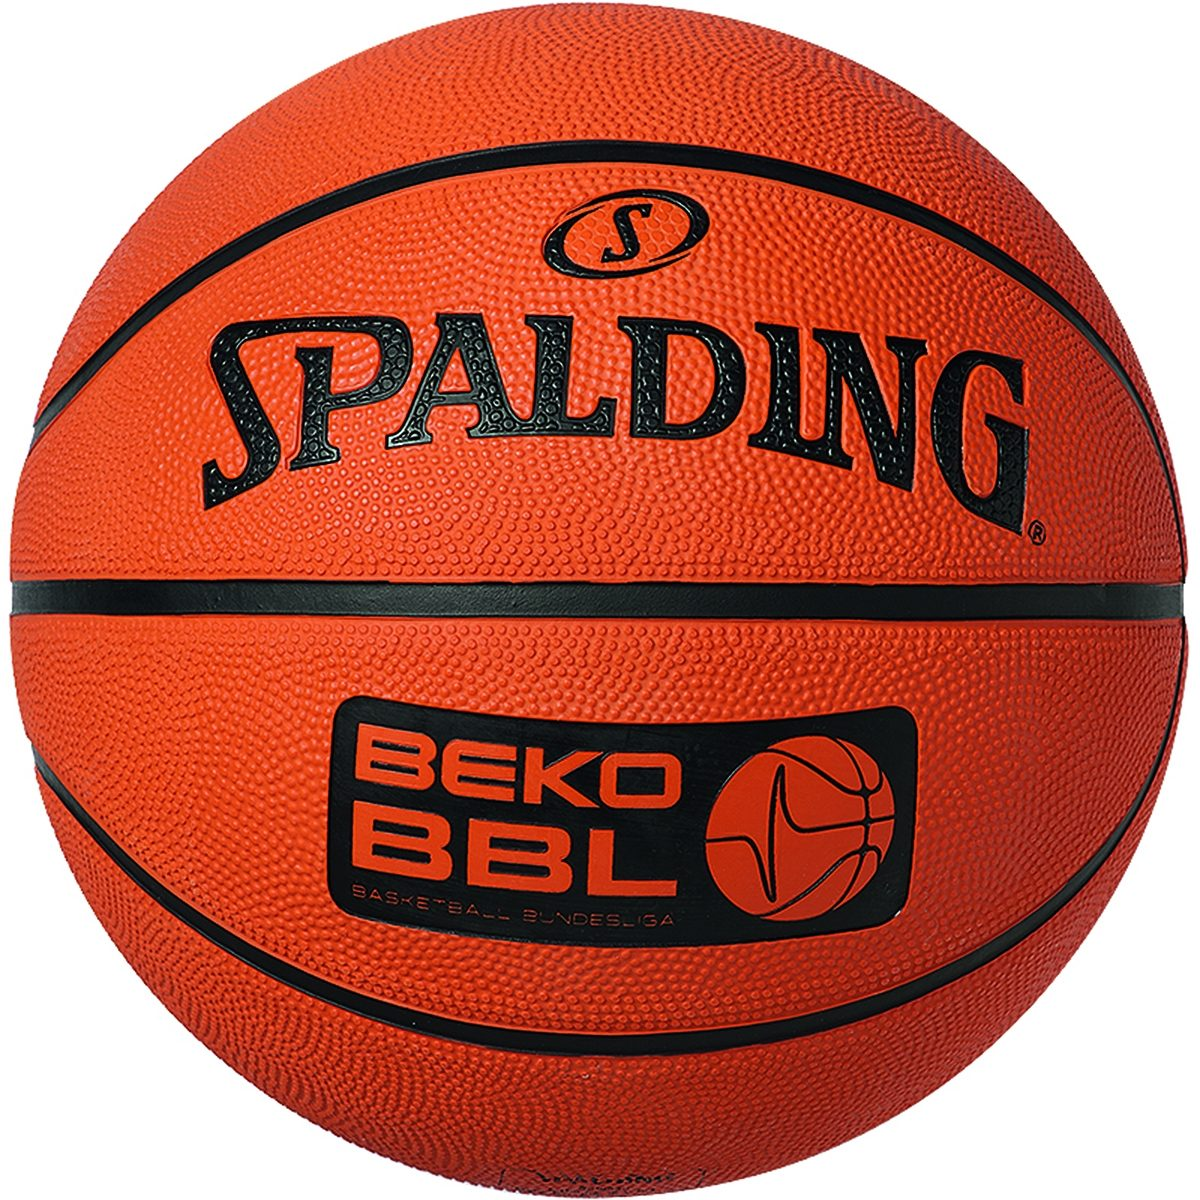 SPALDING BEKO BBL Street Basketball